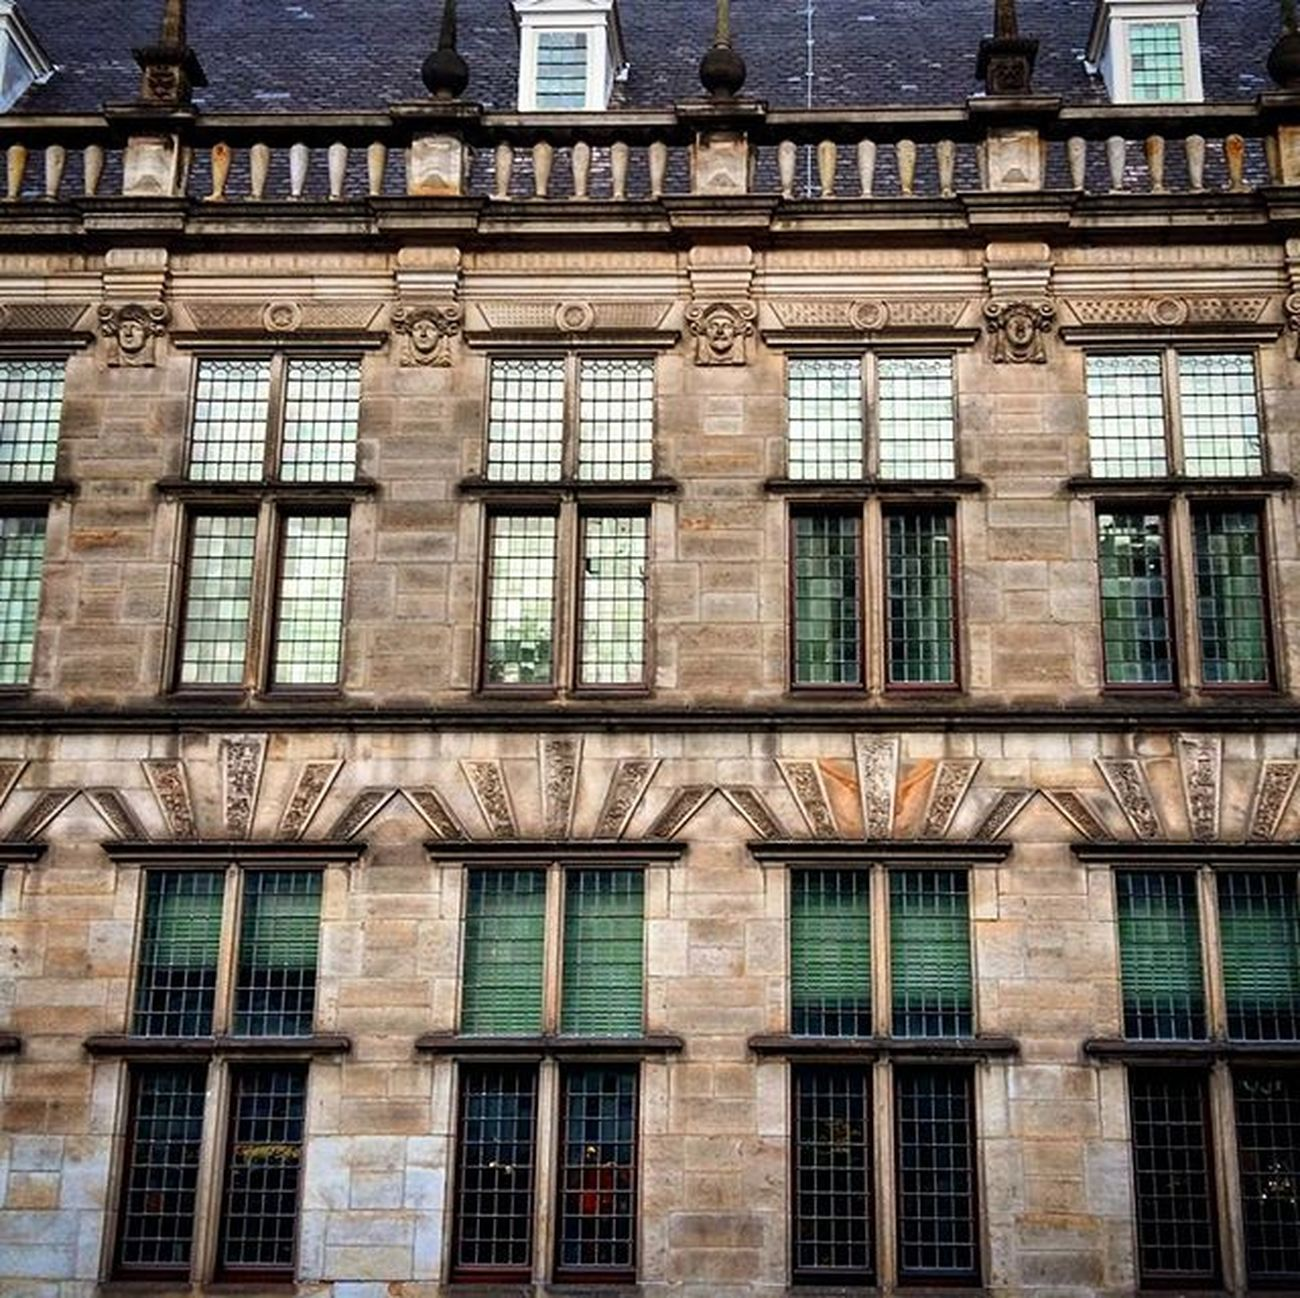 Loveleiden Igleiden OnsLeiden Historicleiden Leiden Breestraat